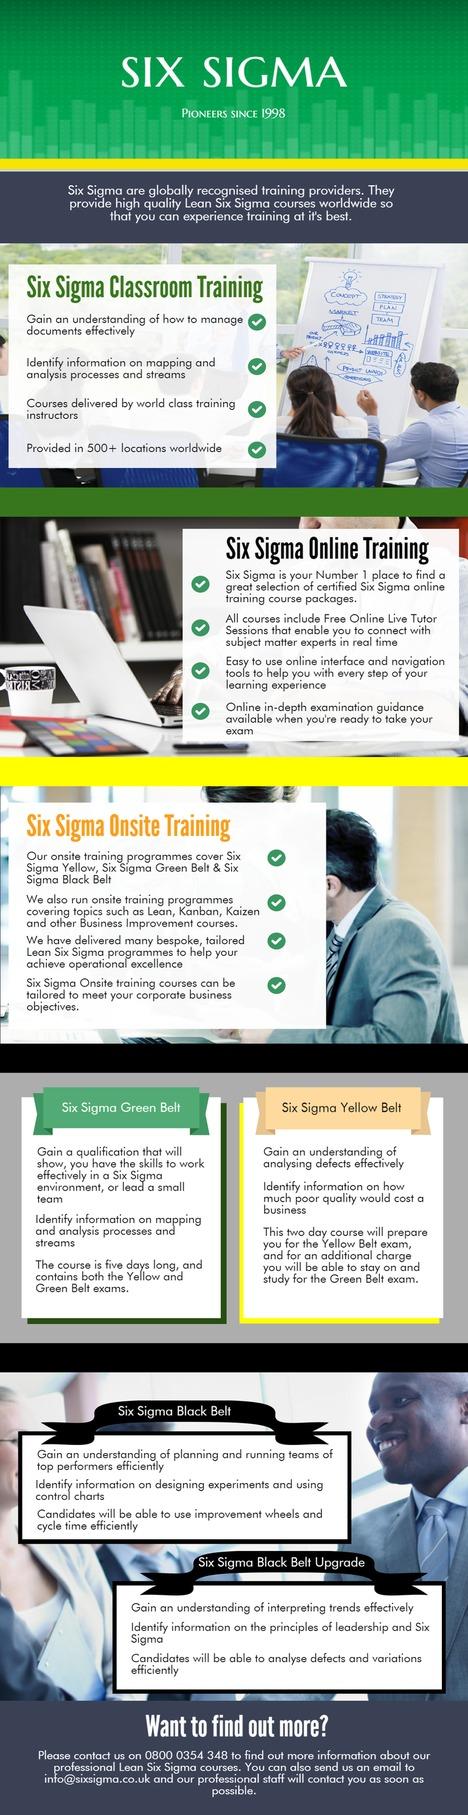 Six Sigma Infographic | Education | Blog